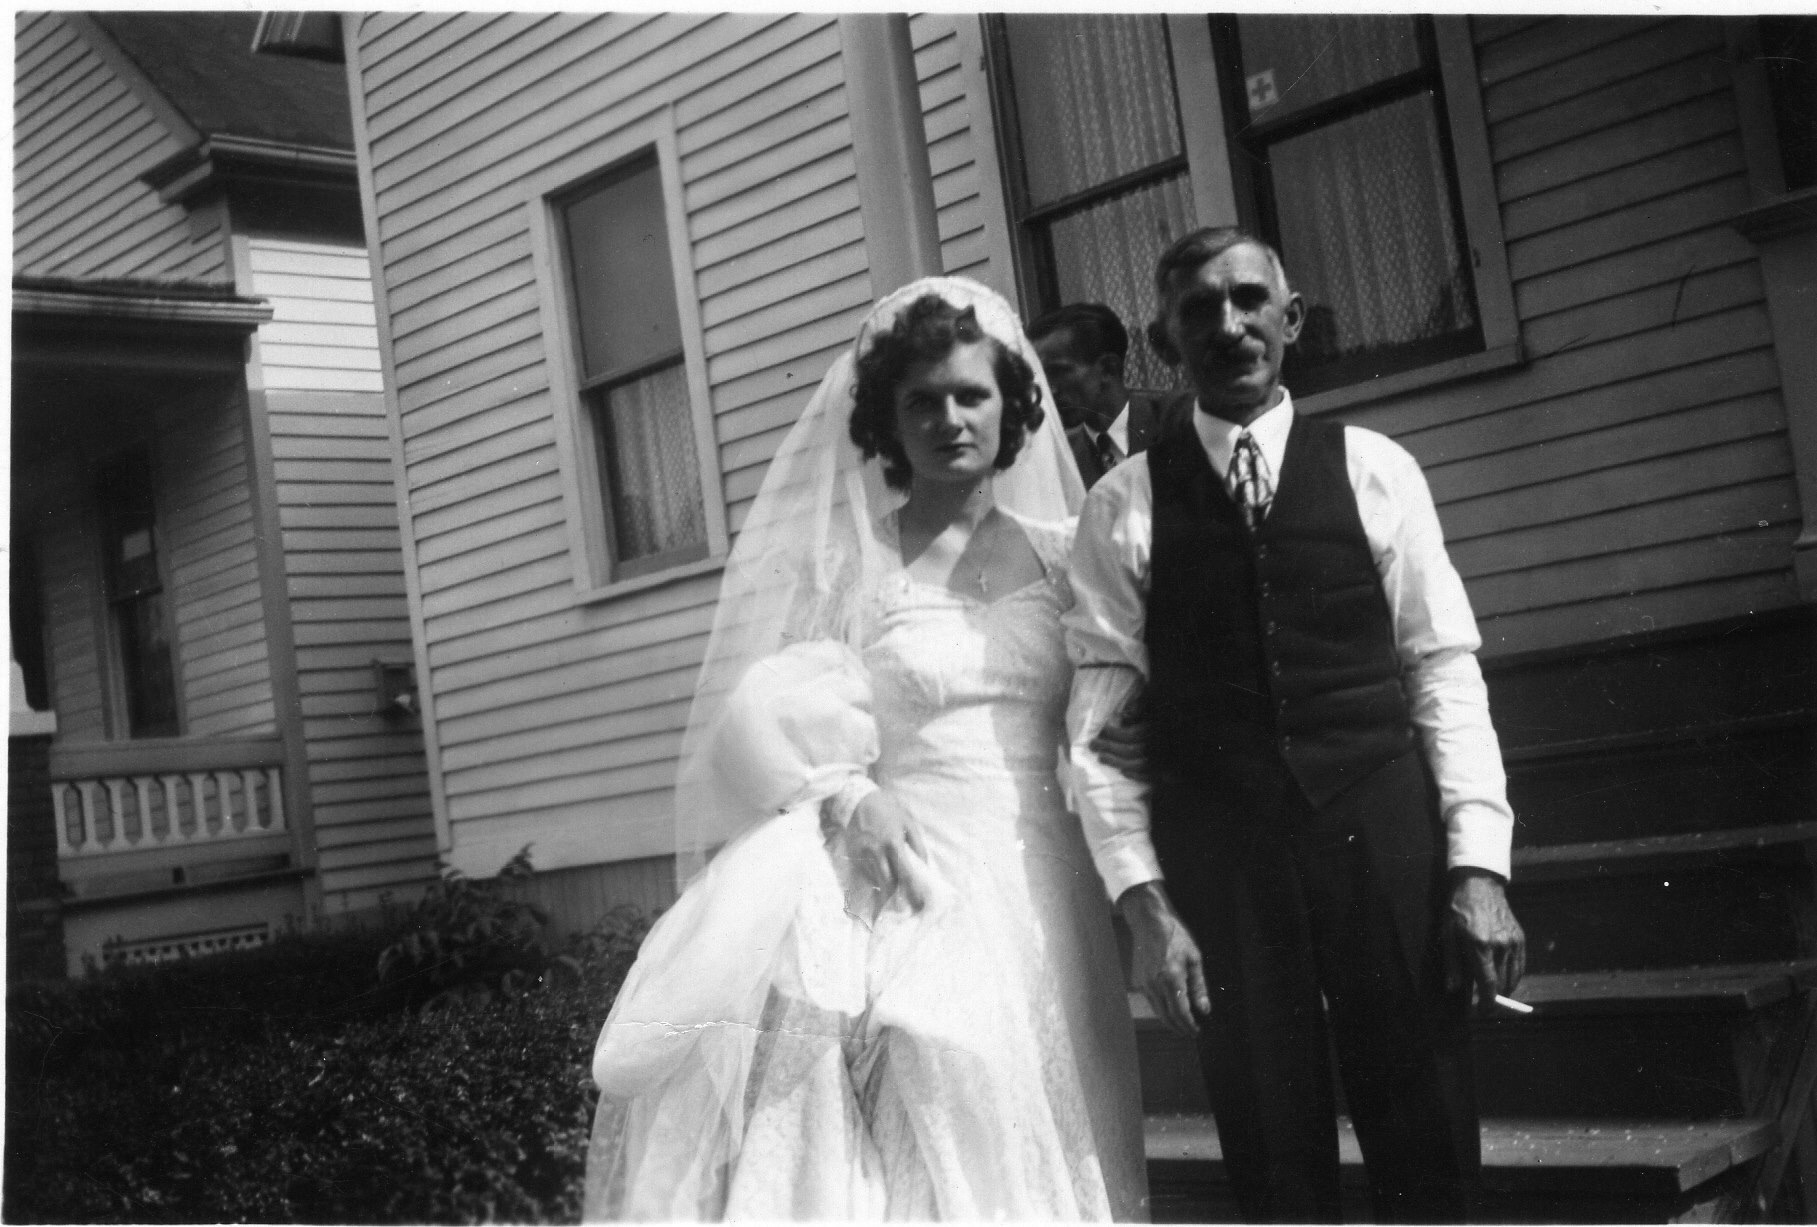 Frances Agacinski Berchulc (1925-2004) One Wedding Day with Adam (her uncle)